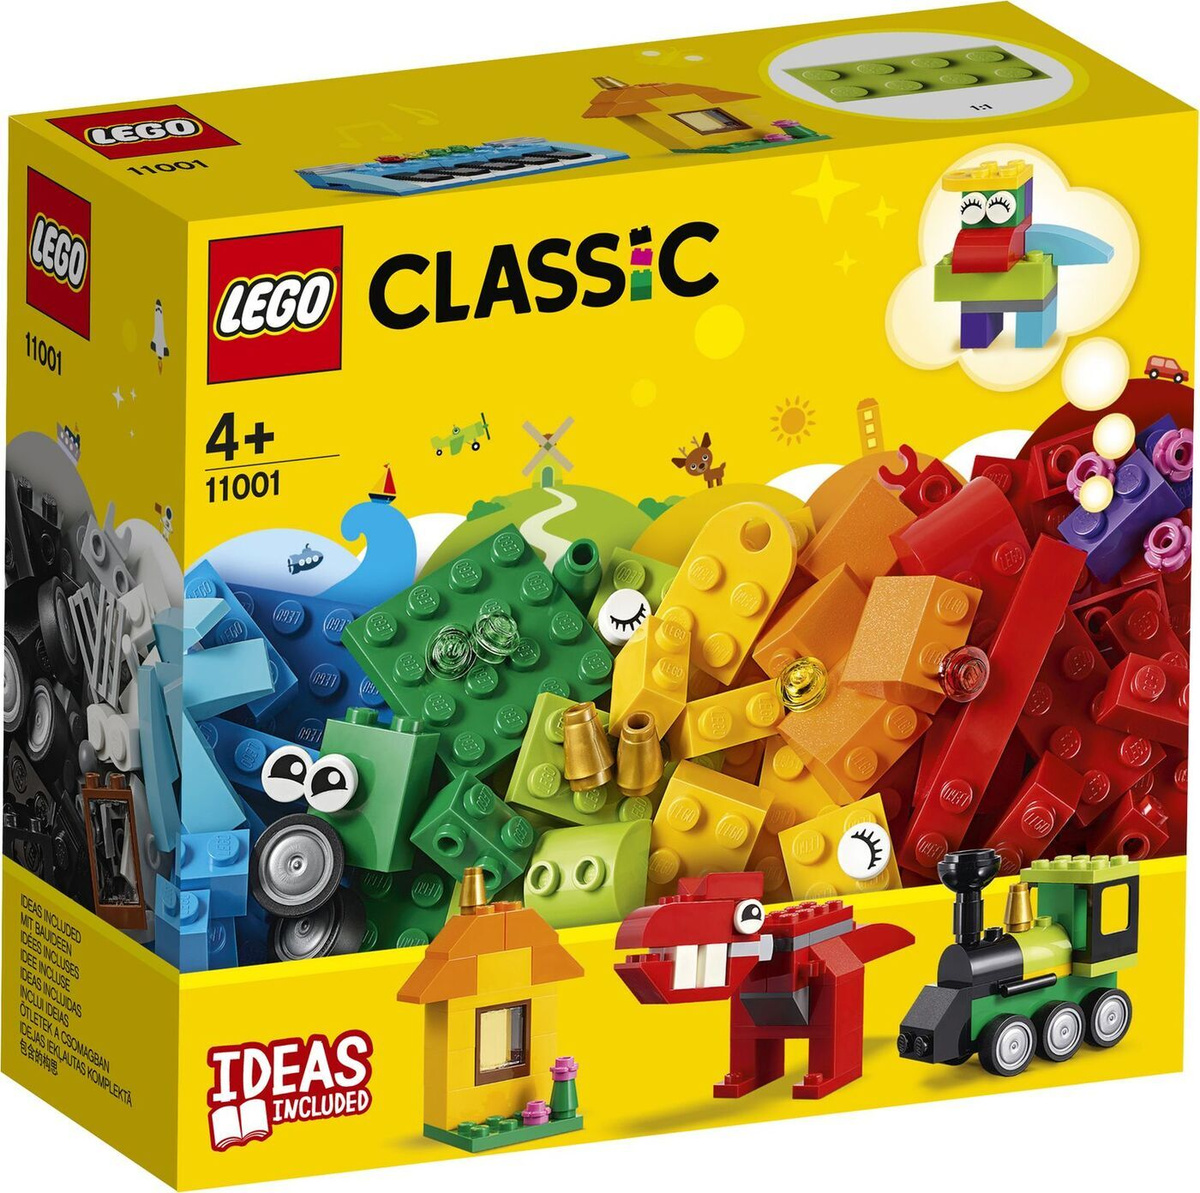 Конструктор LEGO Classic 11001 Модели из кубиков #1